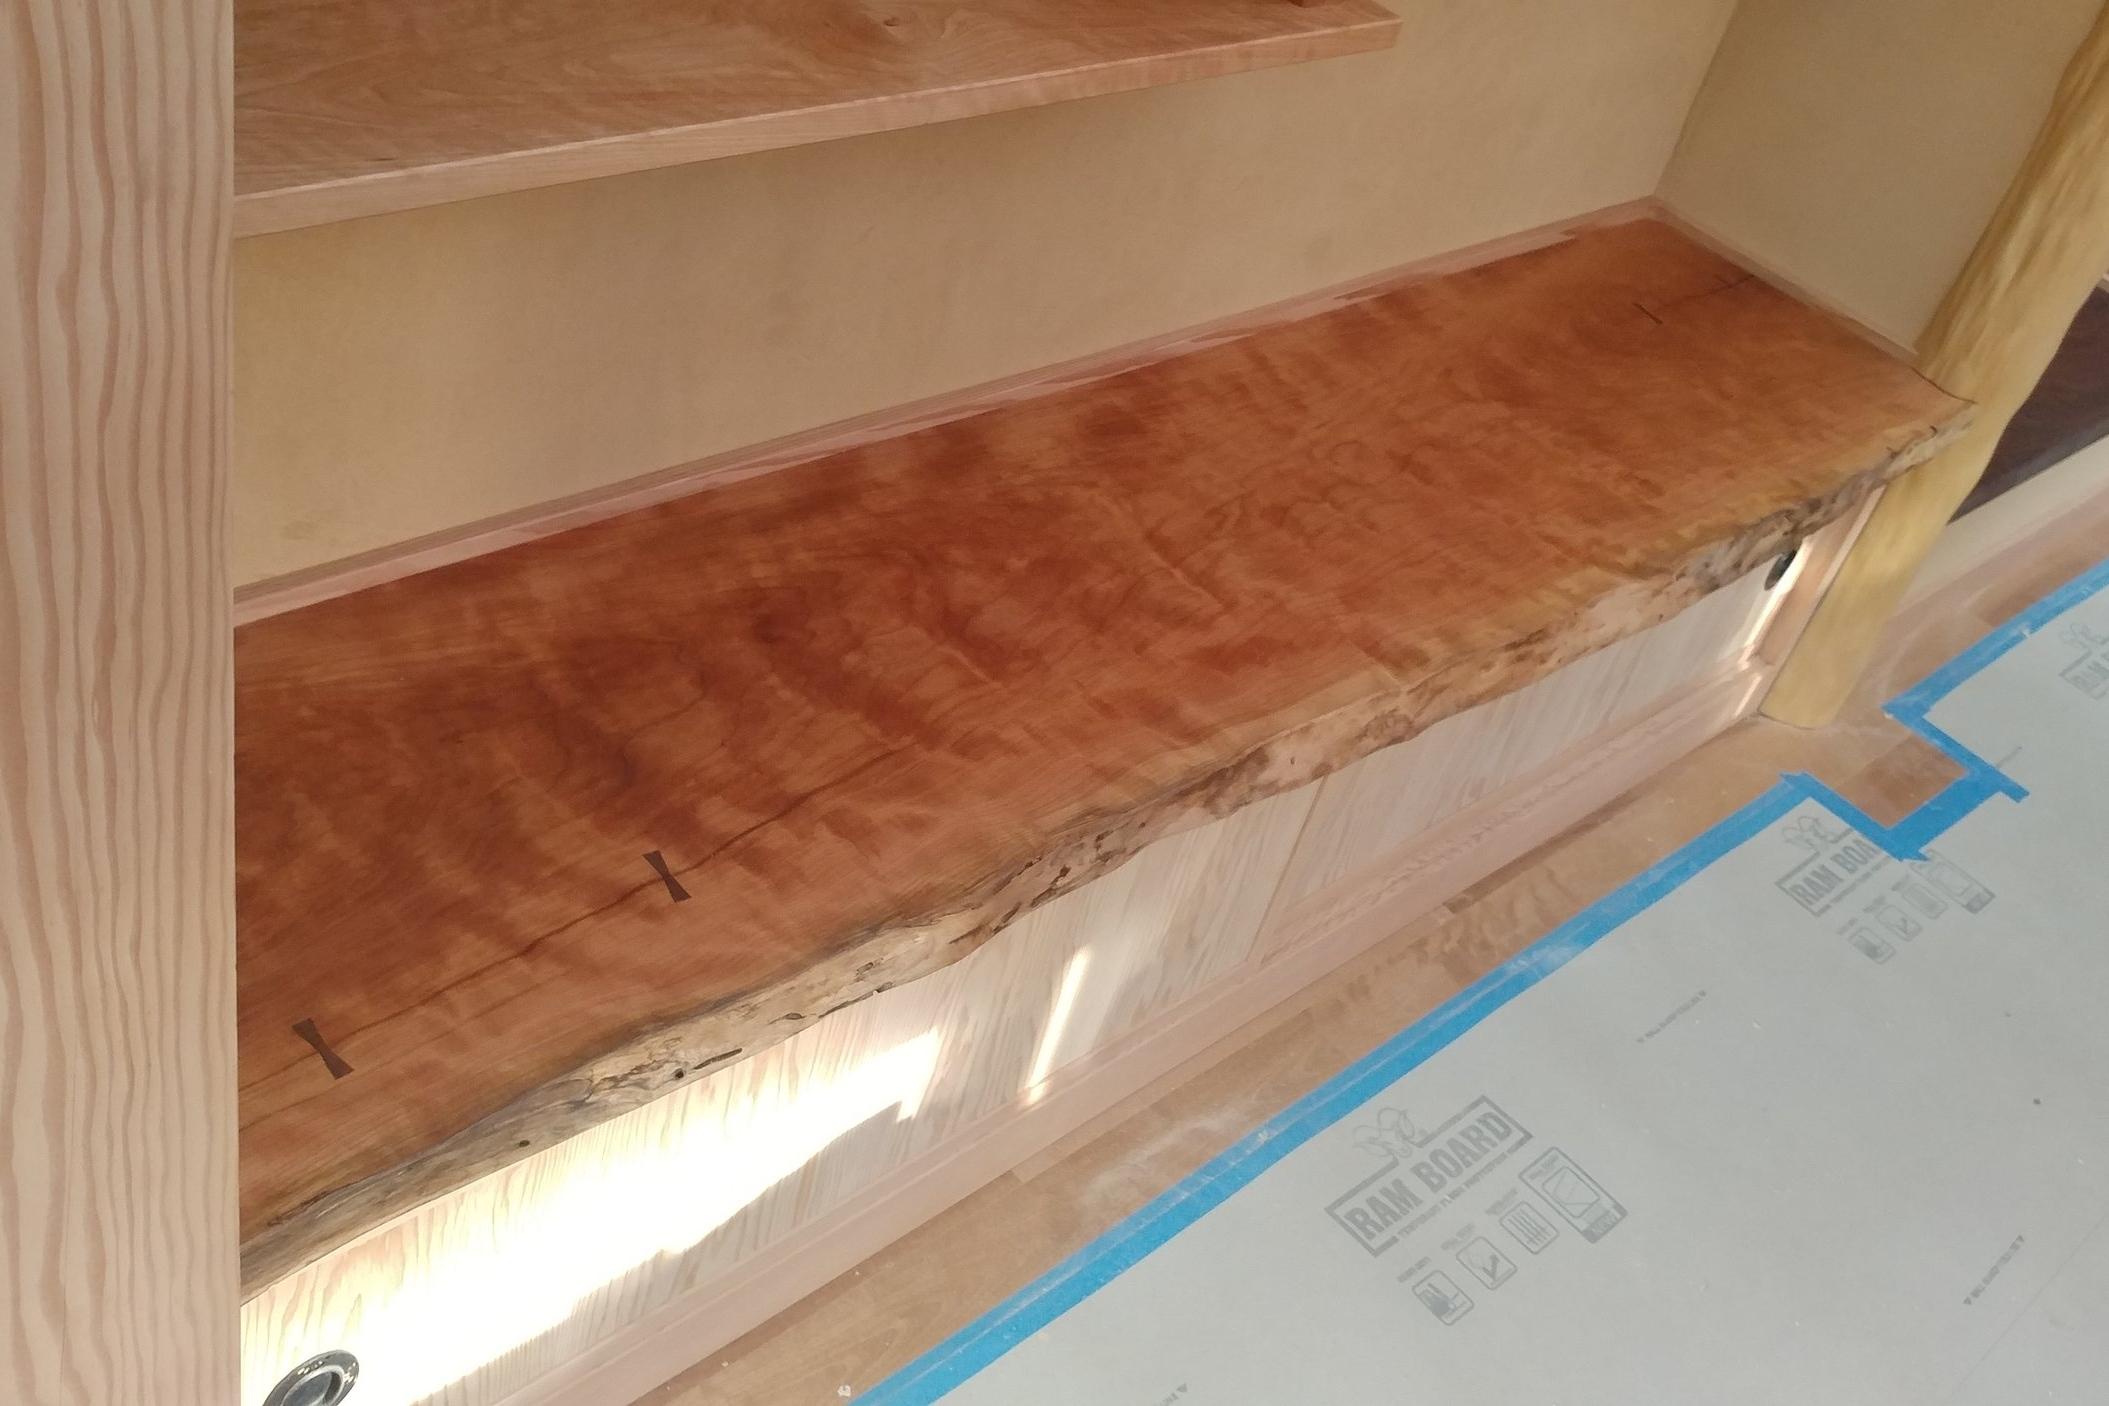 lower-cabinet-slab.jpg